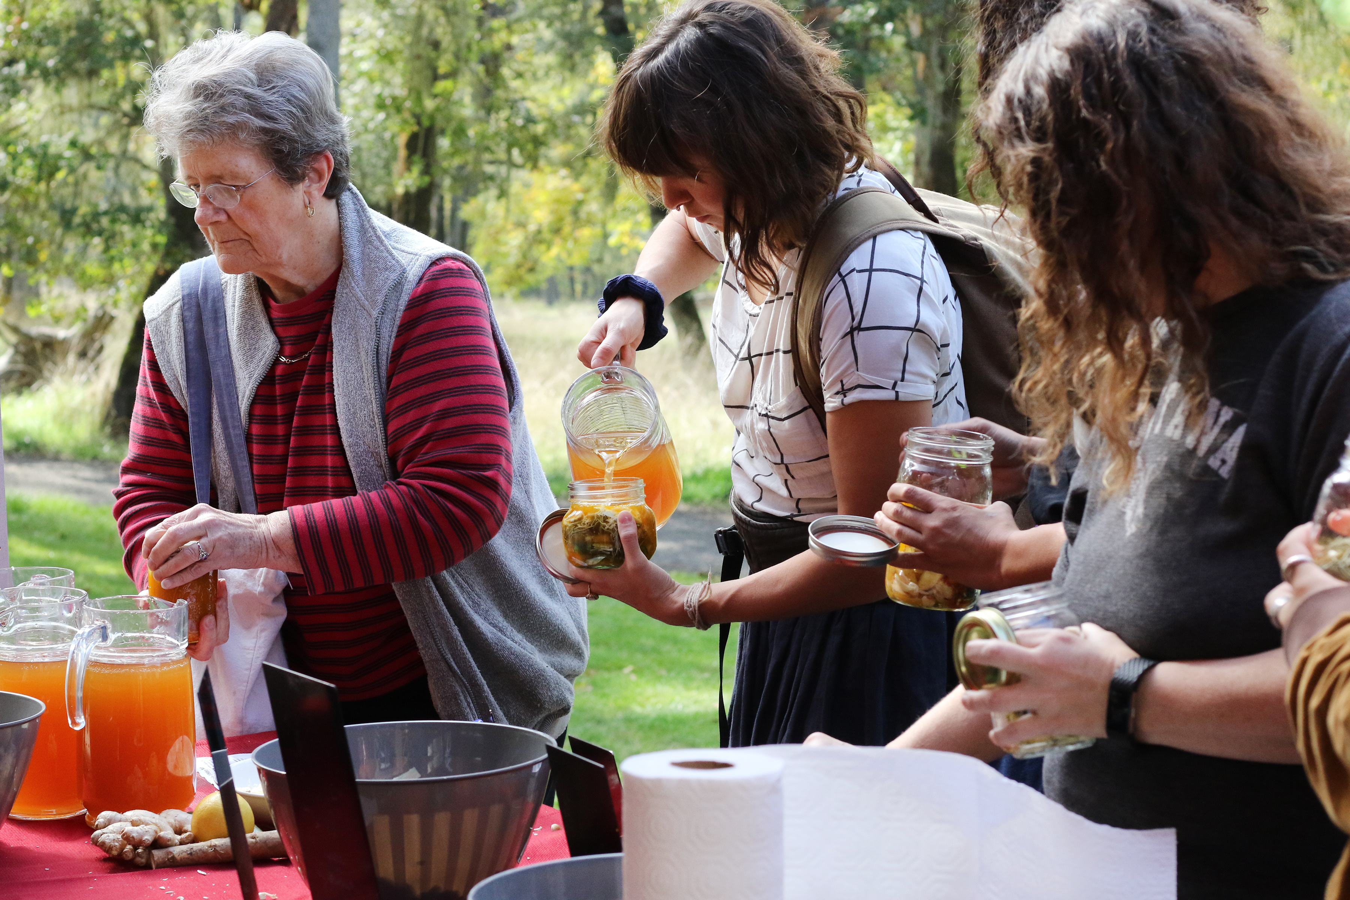 Community members pouring tea